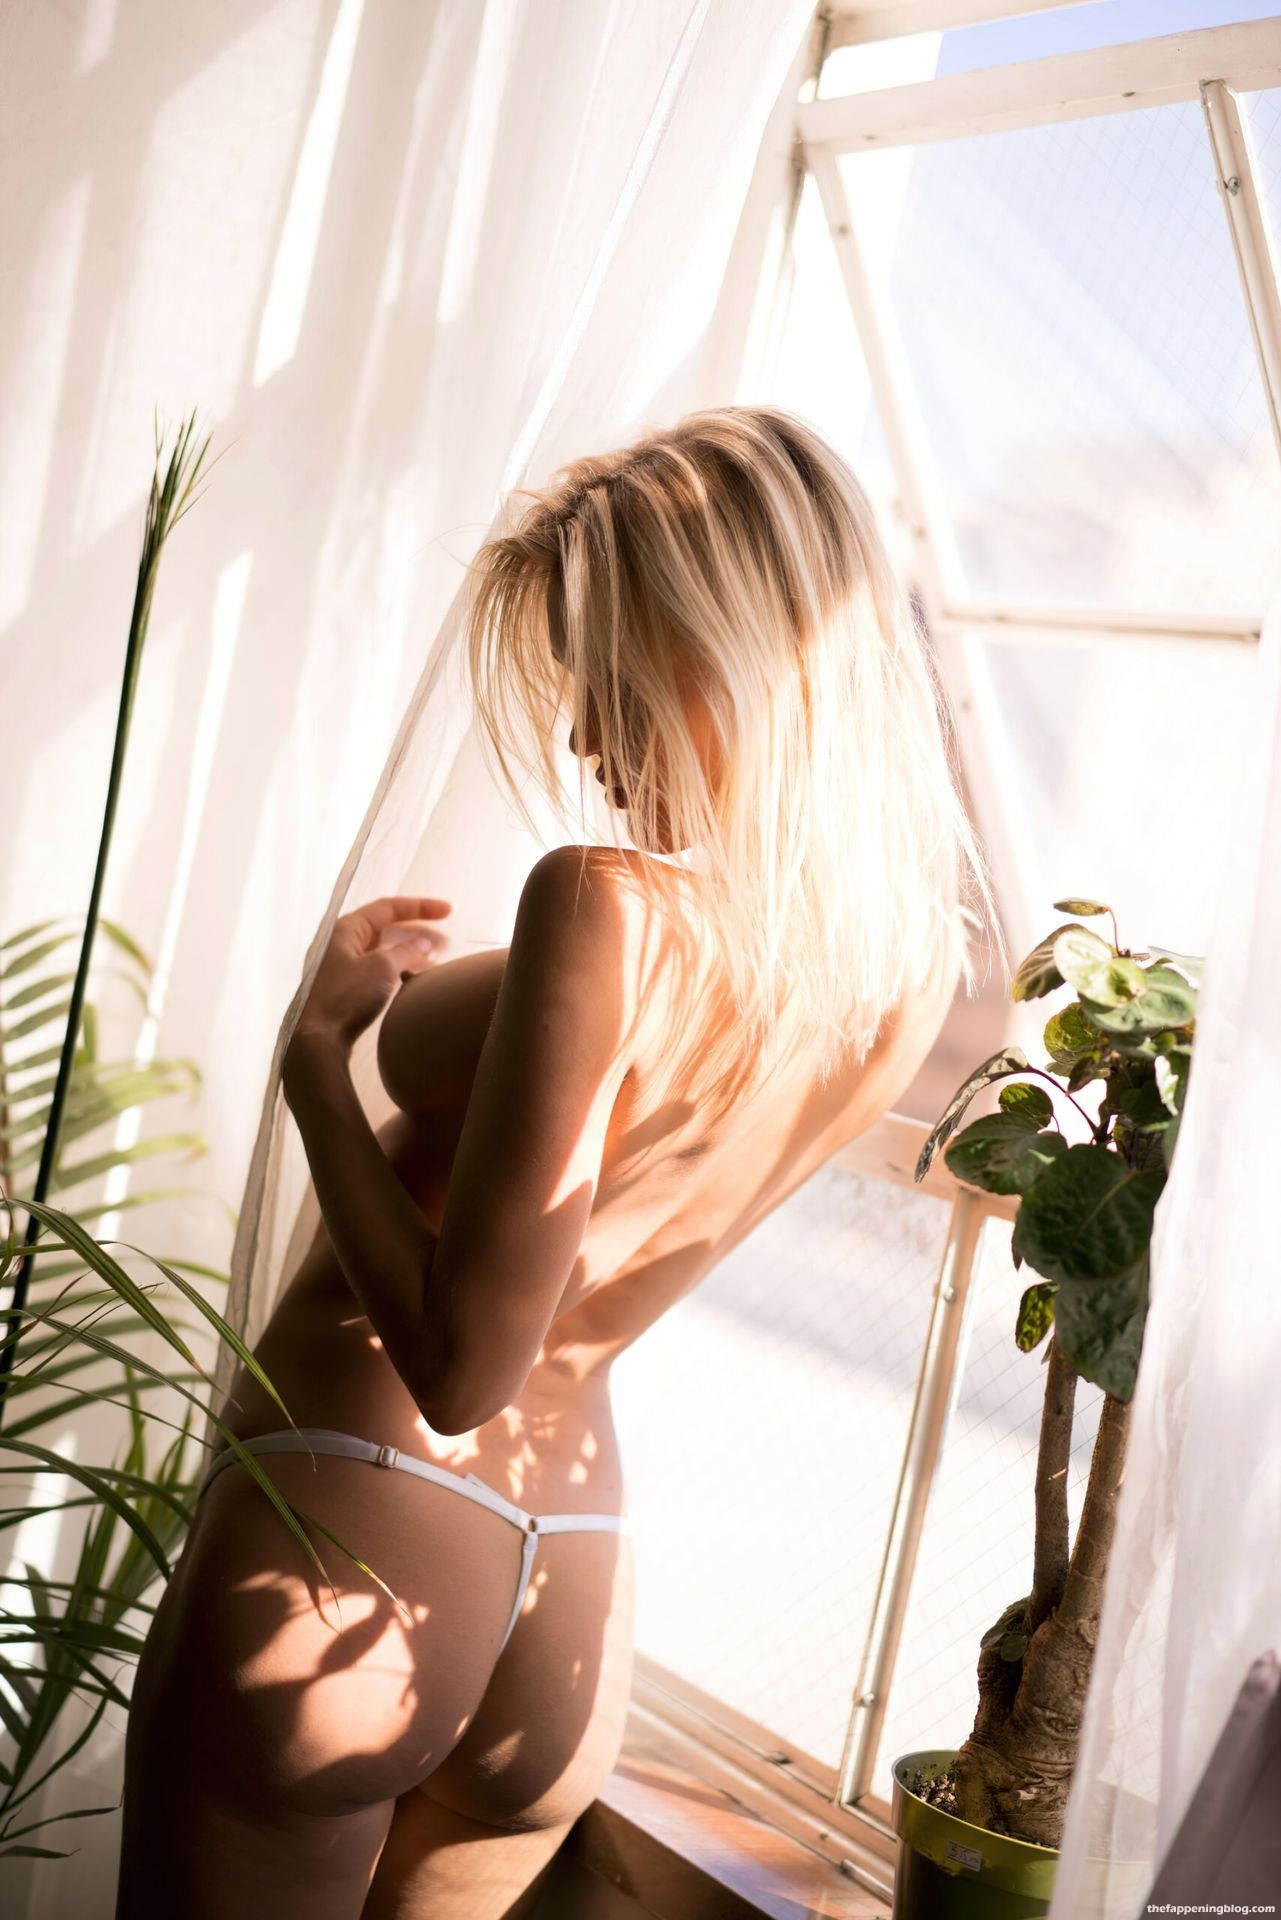 Joy-Corrigan-Naked-Tits-and-Ass-17-scaled1-thefappeningblog.com_.jpg